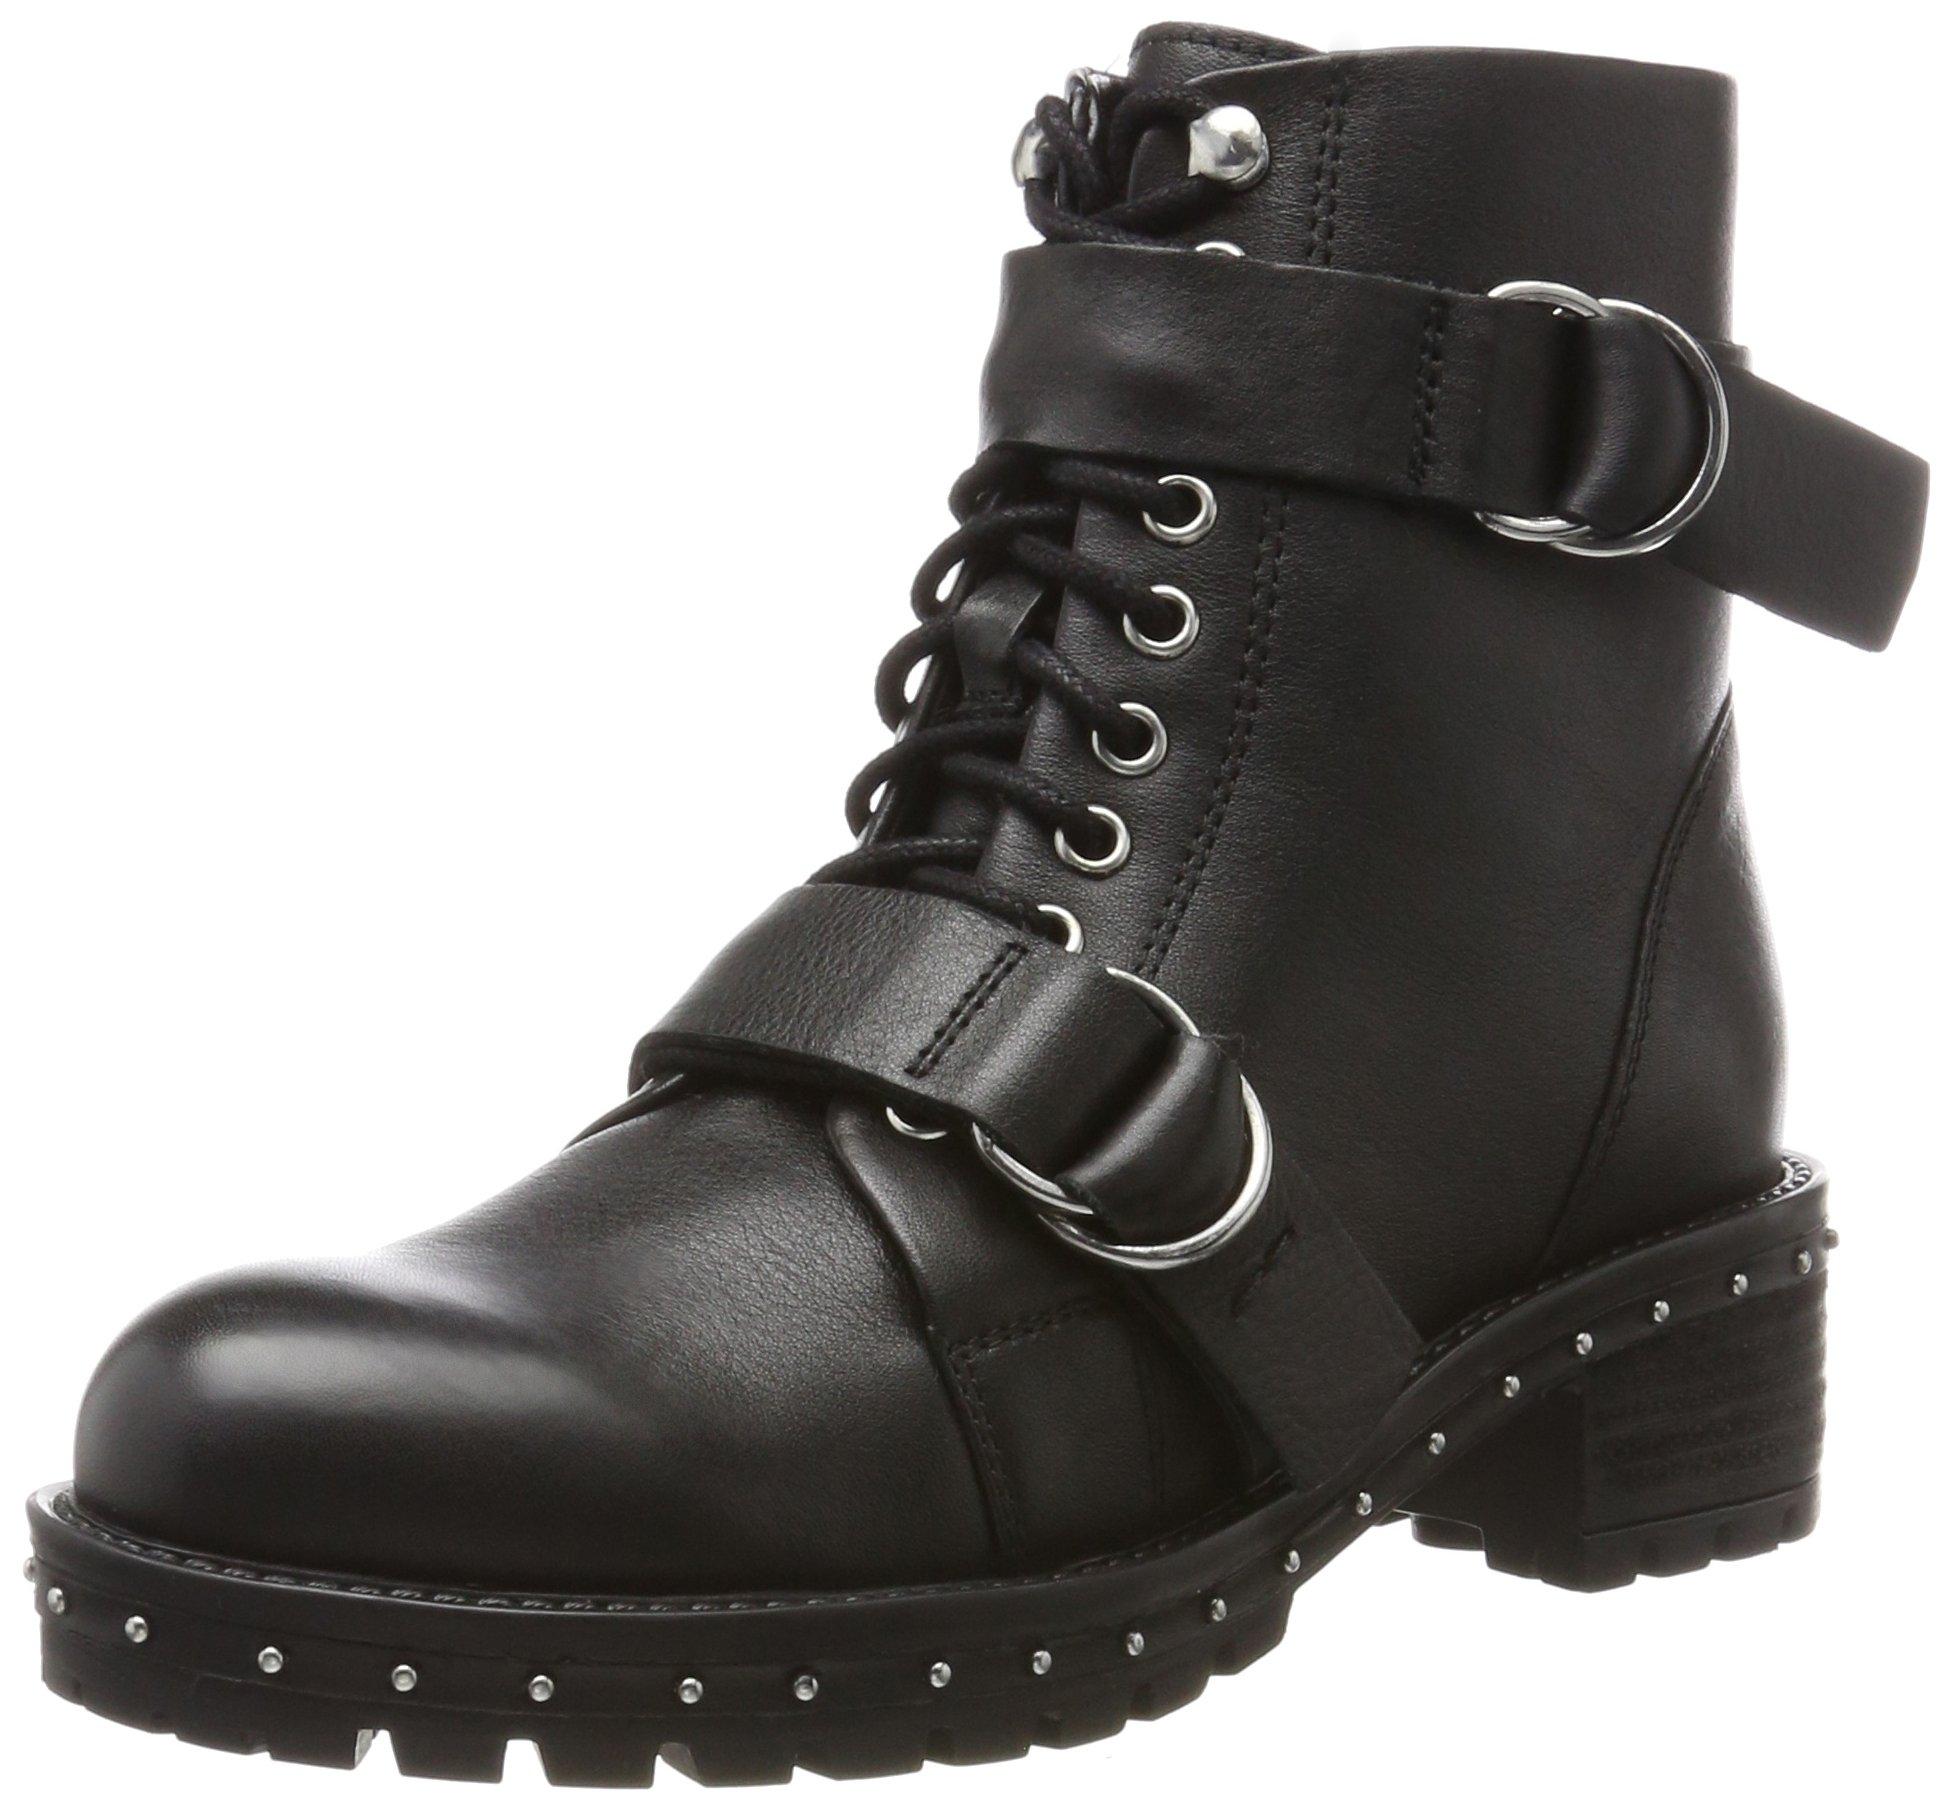 Bronx 18736 Bx silver Eu falkoxRangers 1417 Boots FemmeNoirblack Bnew 7Ygyb6f